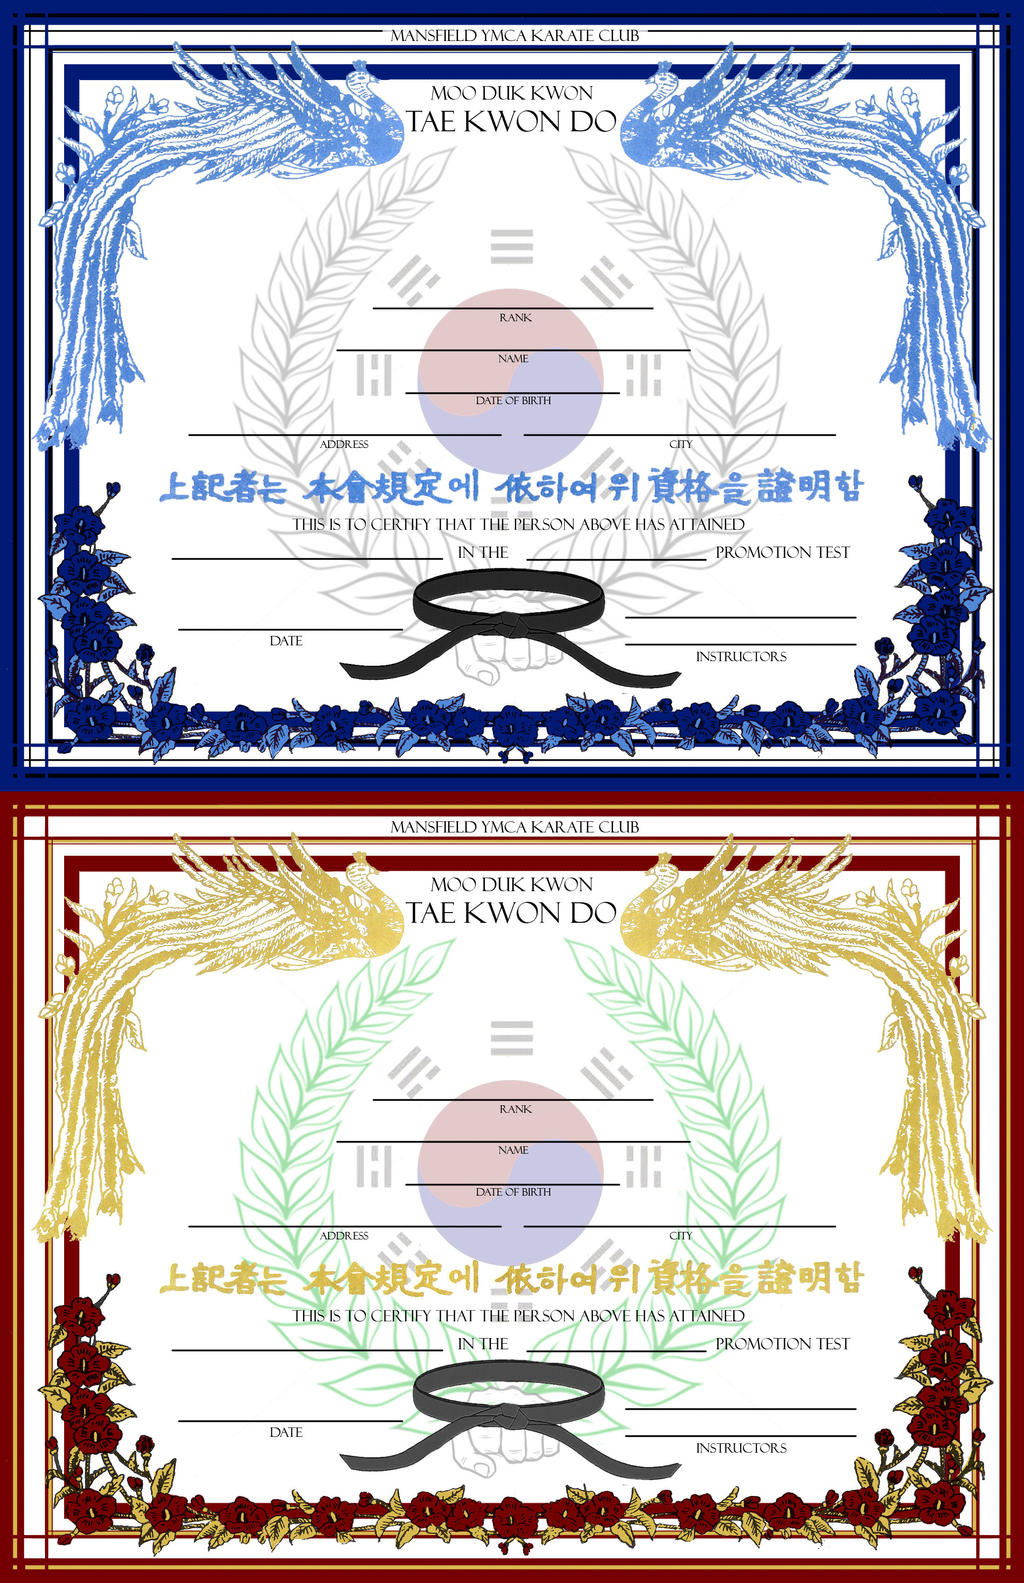 Belt certificate template by gravityarchangel on deviantart for Martial art certificate templates free